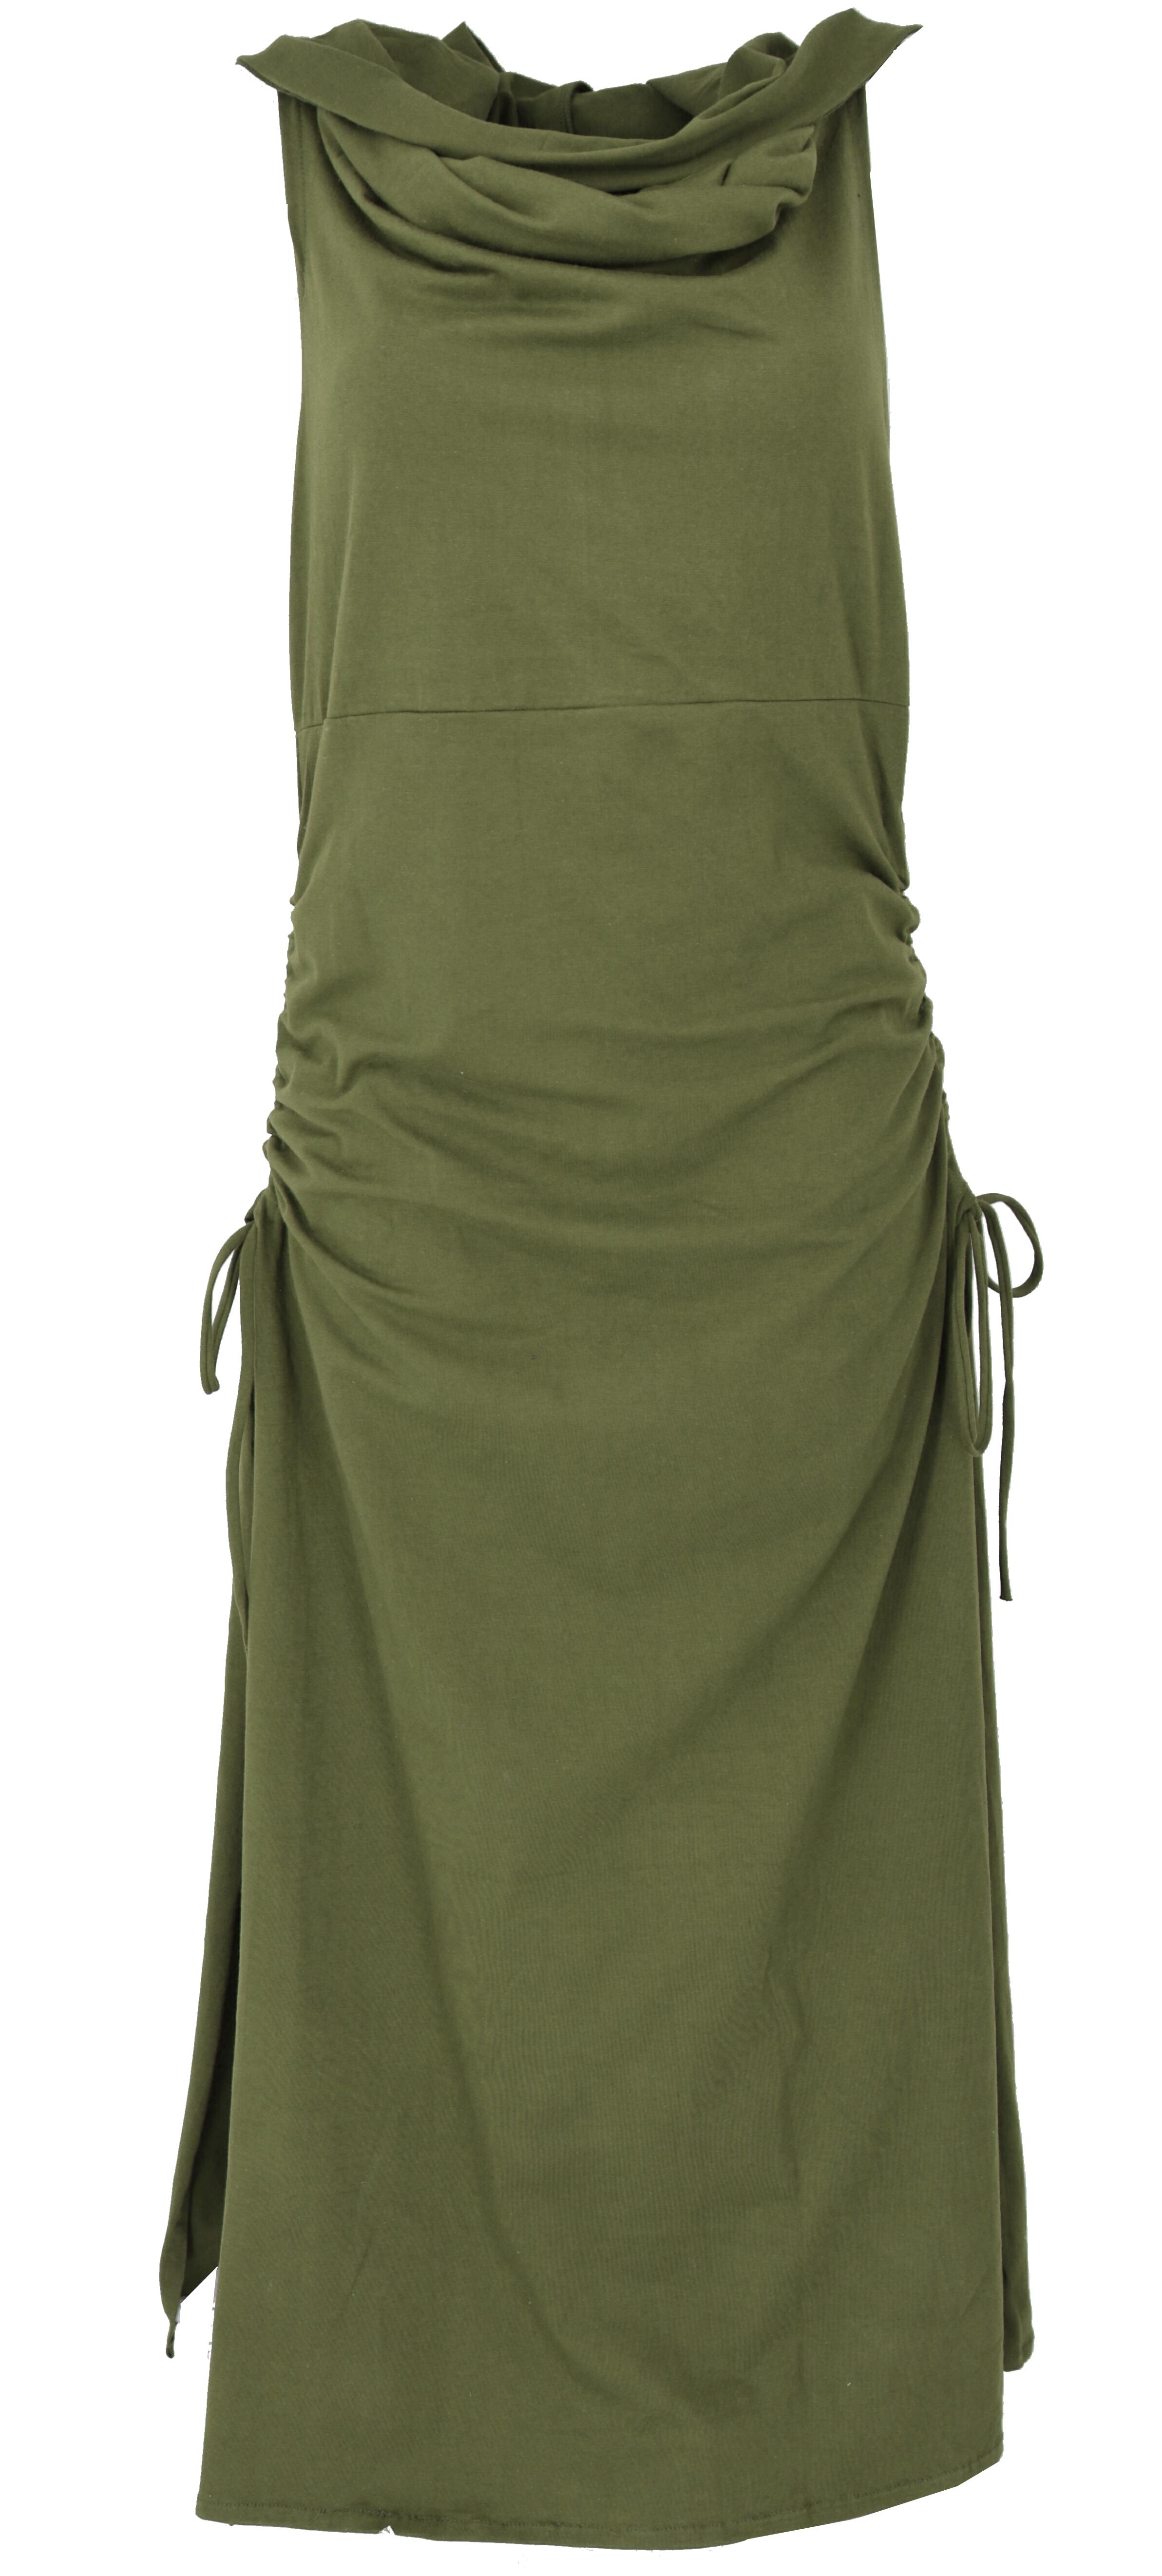 Wandelbares Goa Kleid, Psytrance Festival Kleid   olivgrün